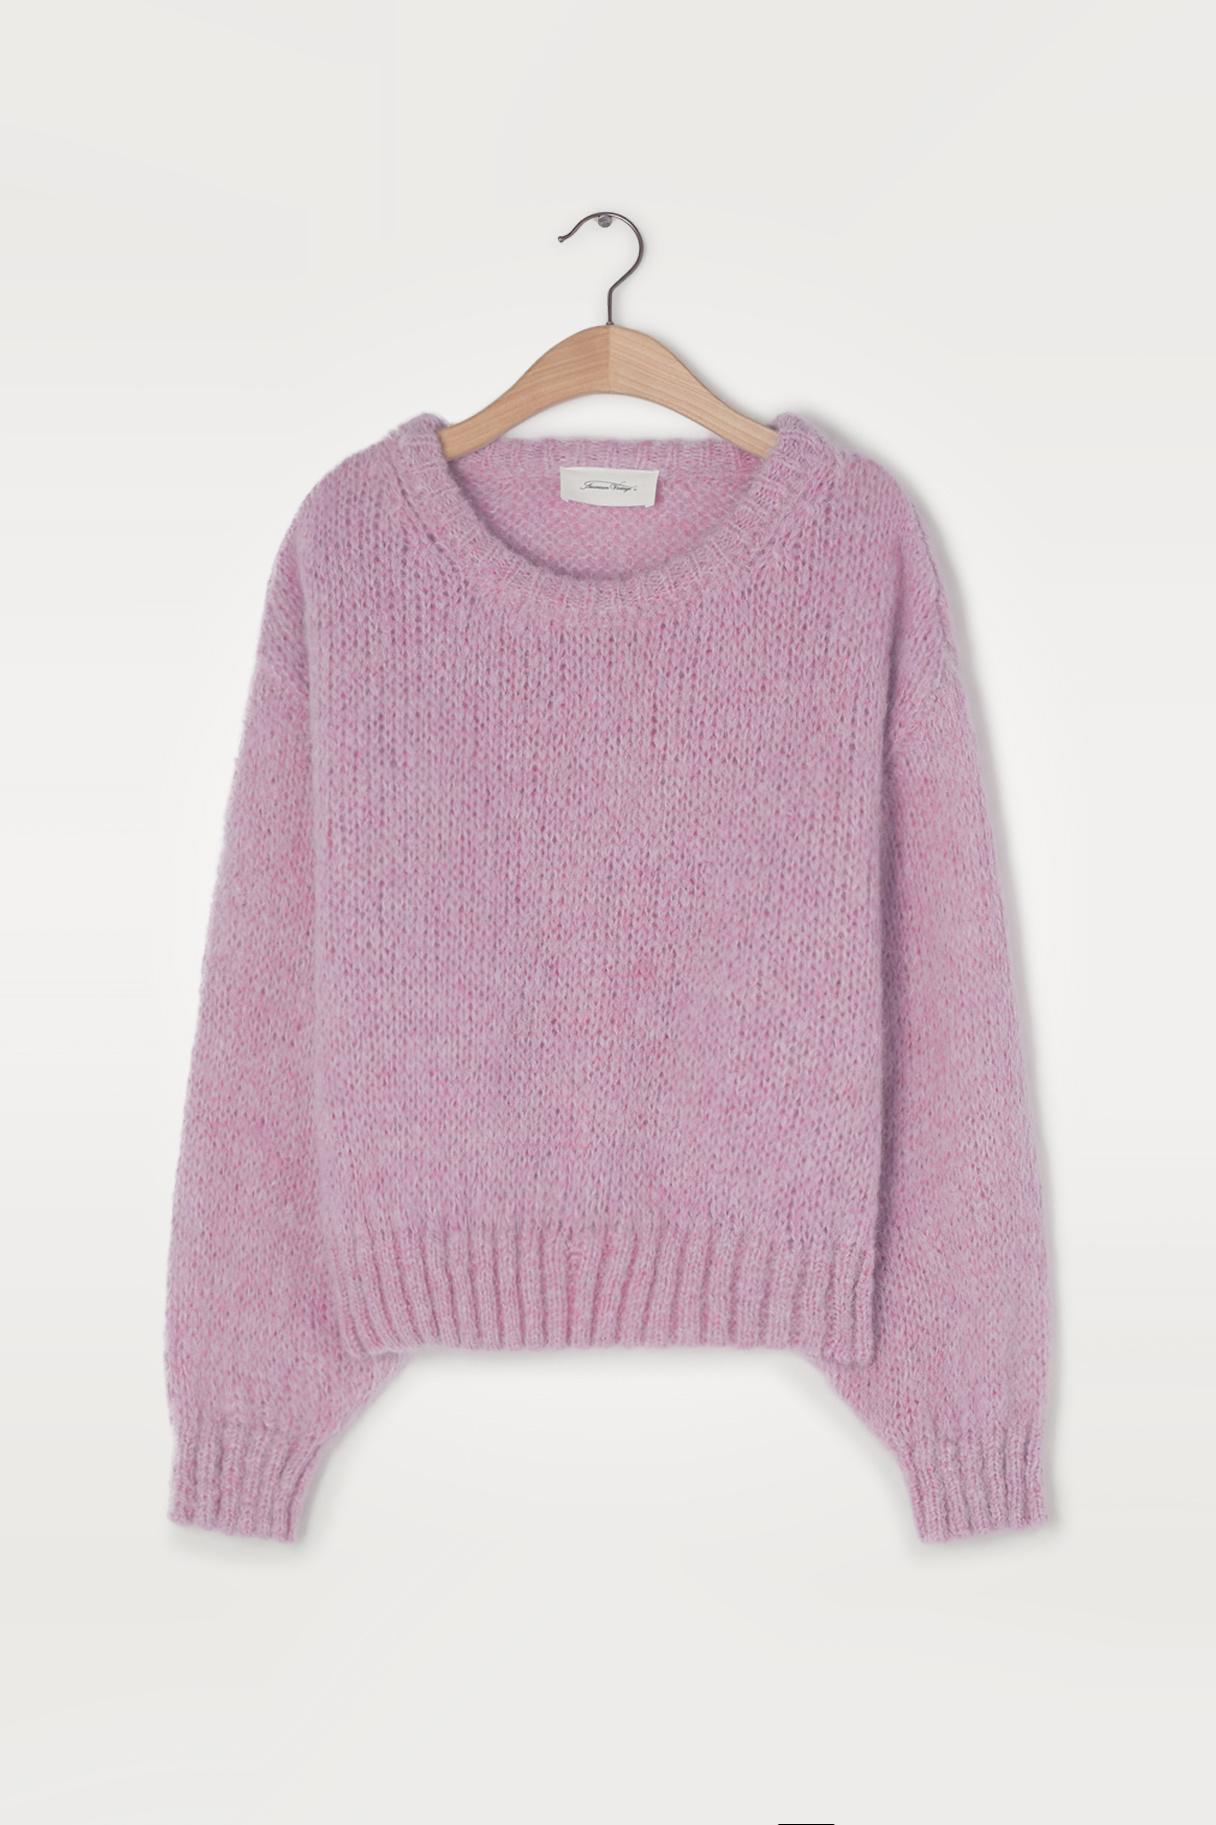 Vogbay Pullover - Prunelle Chine-6